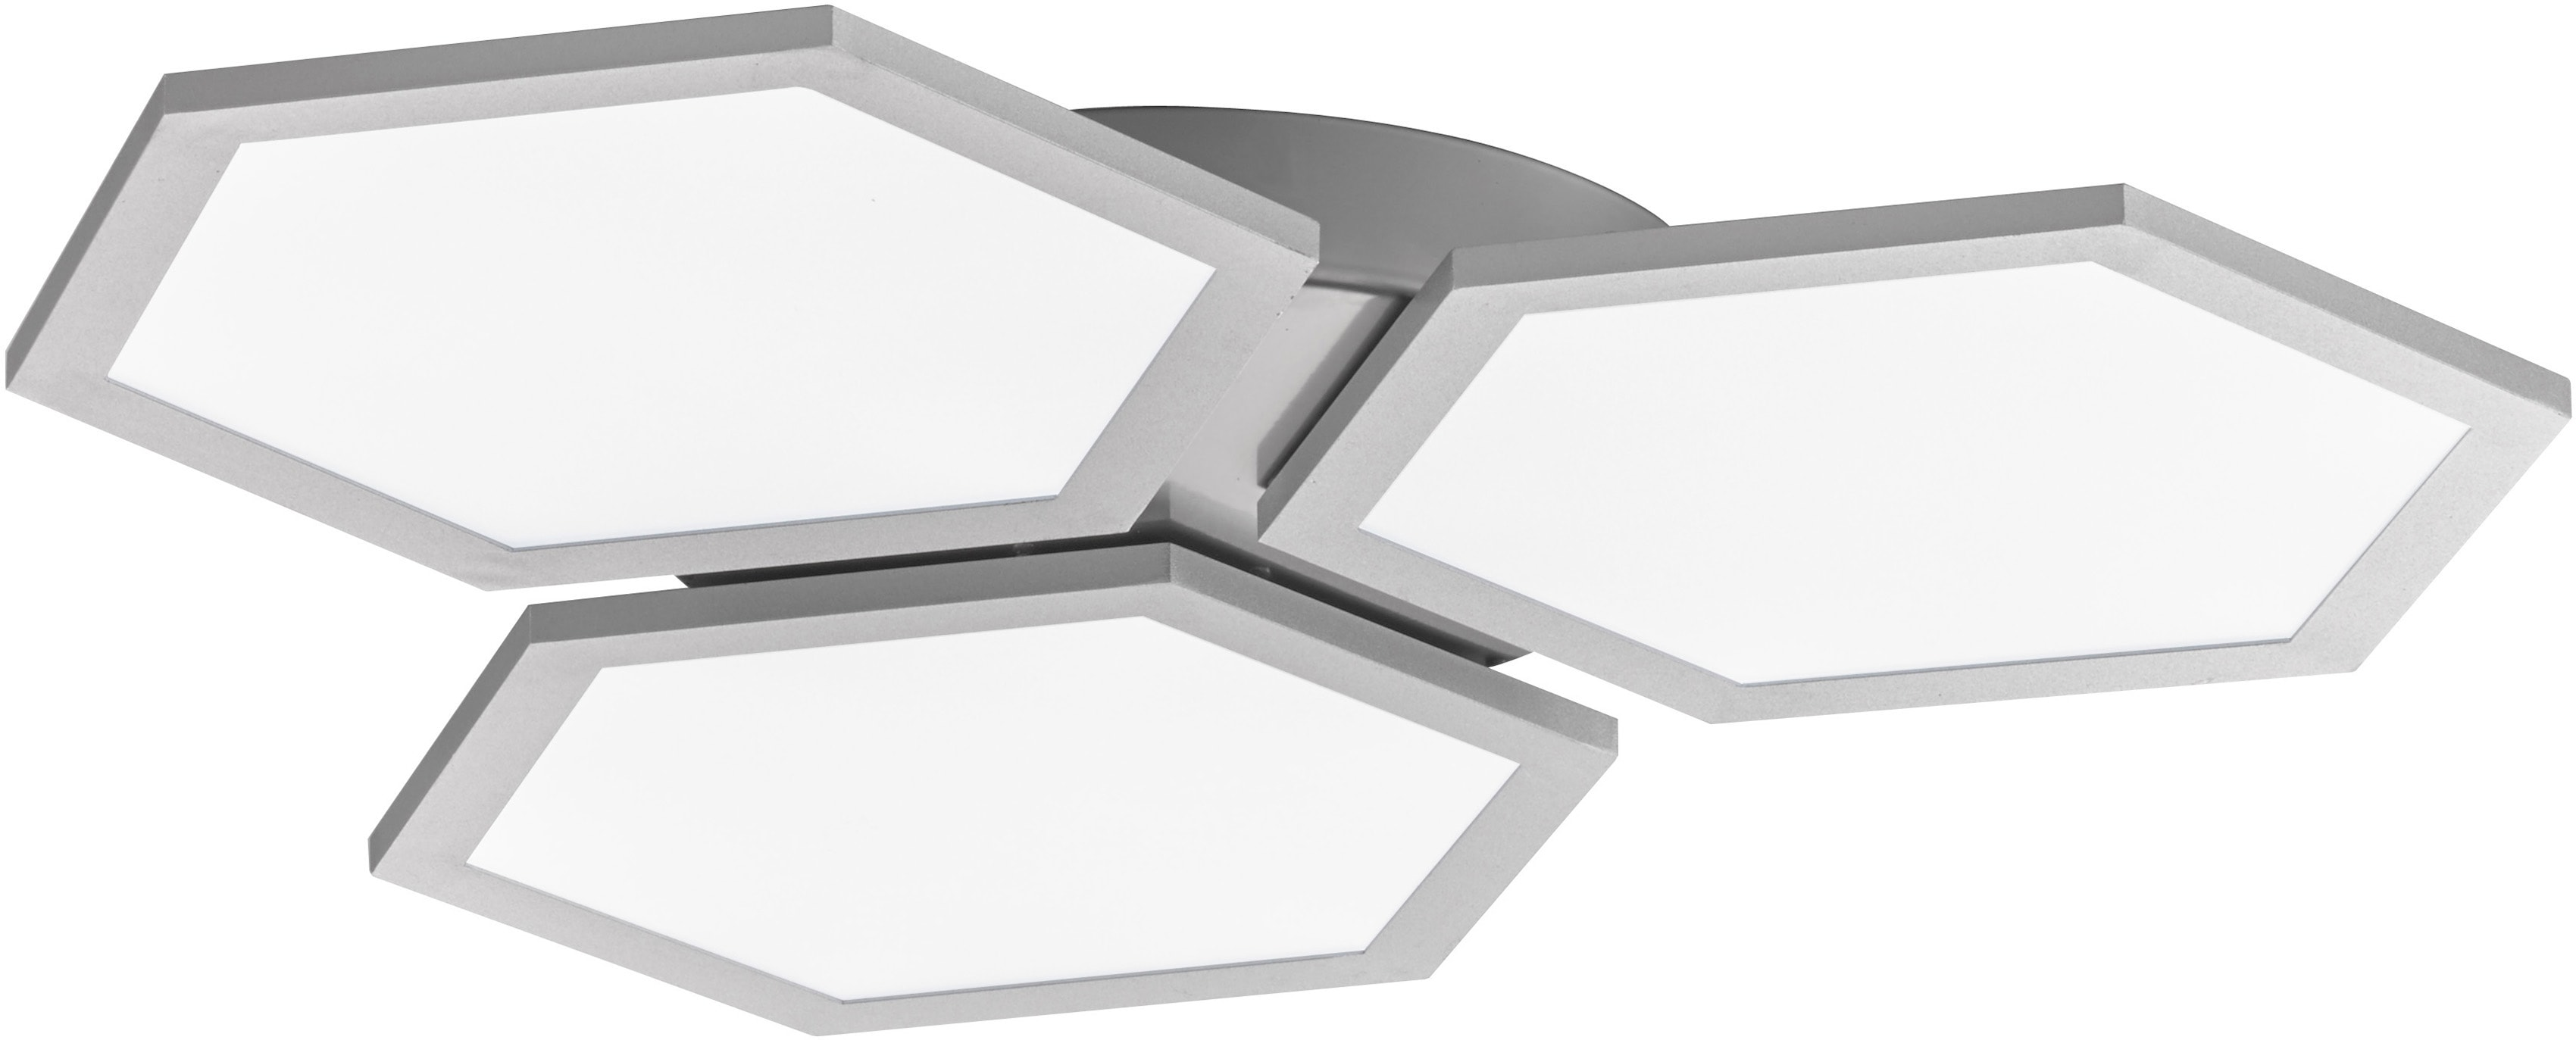 FISCHER & HONSEL LED Deckenleuchte Tiara, LED-Board, 1 St., LED Deckenlampe